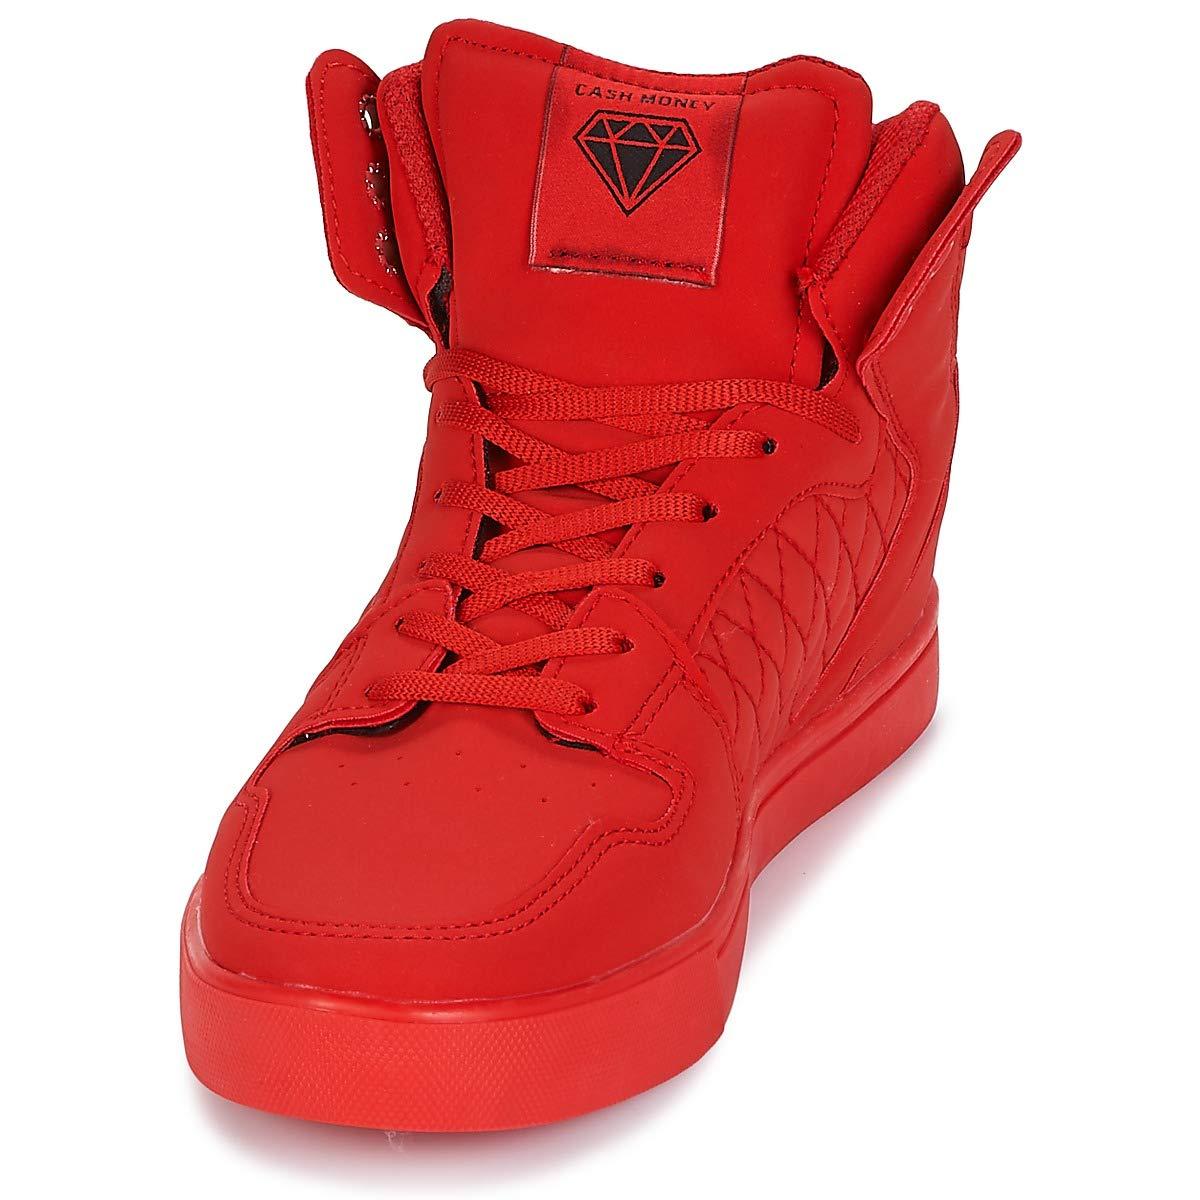 941566d317 Cash Money CMS13 JAILOR Sneaker Herren Rot Sneaker High: Amazon.de: Schuhe  & Handtaschen